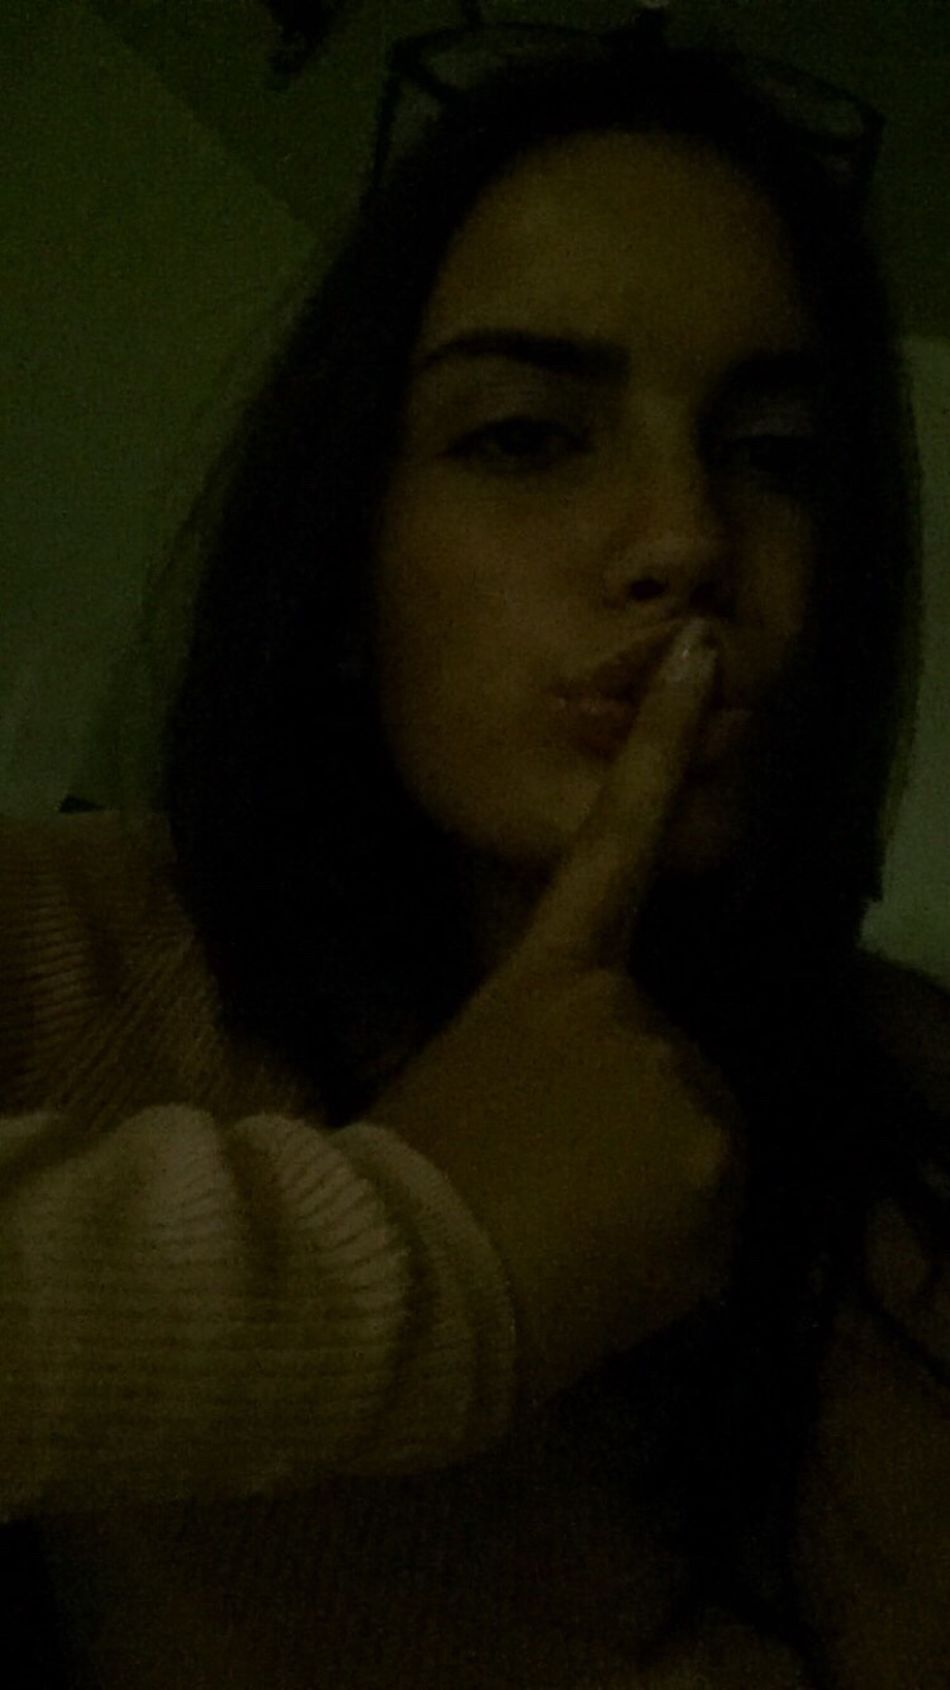 Shh Young Women Long Hair Girl Smile Selfie ✌ Hello World Hello Kiyomi Mitsuki Snapchat Me :)  ThatsMe Enjoying Life